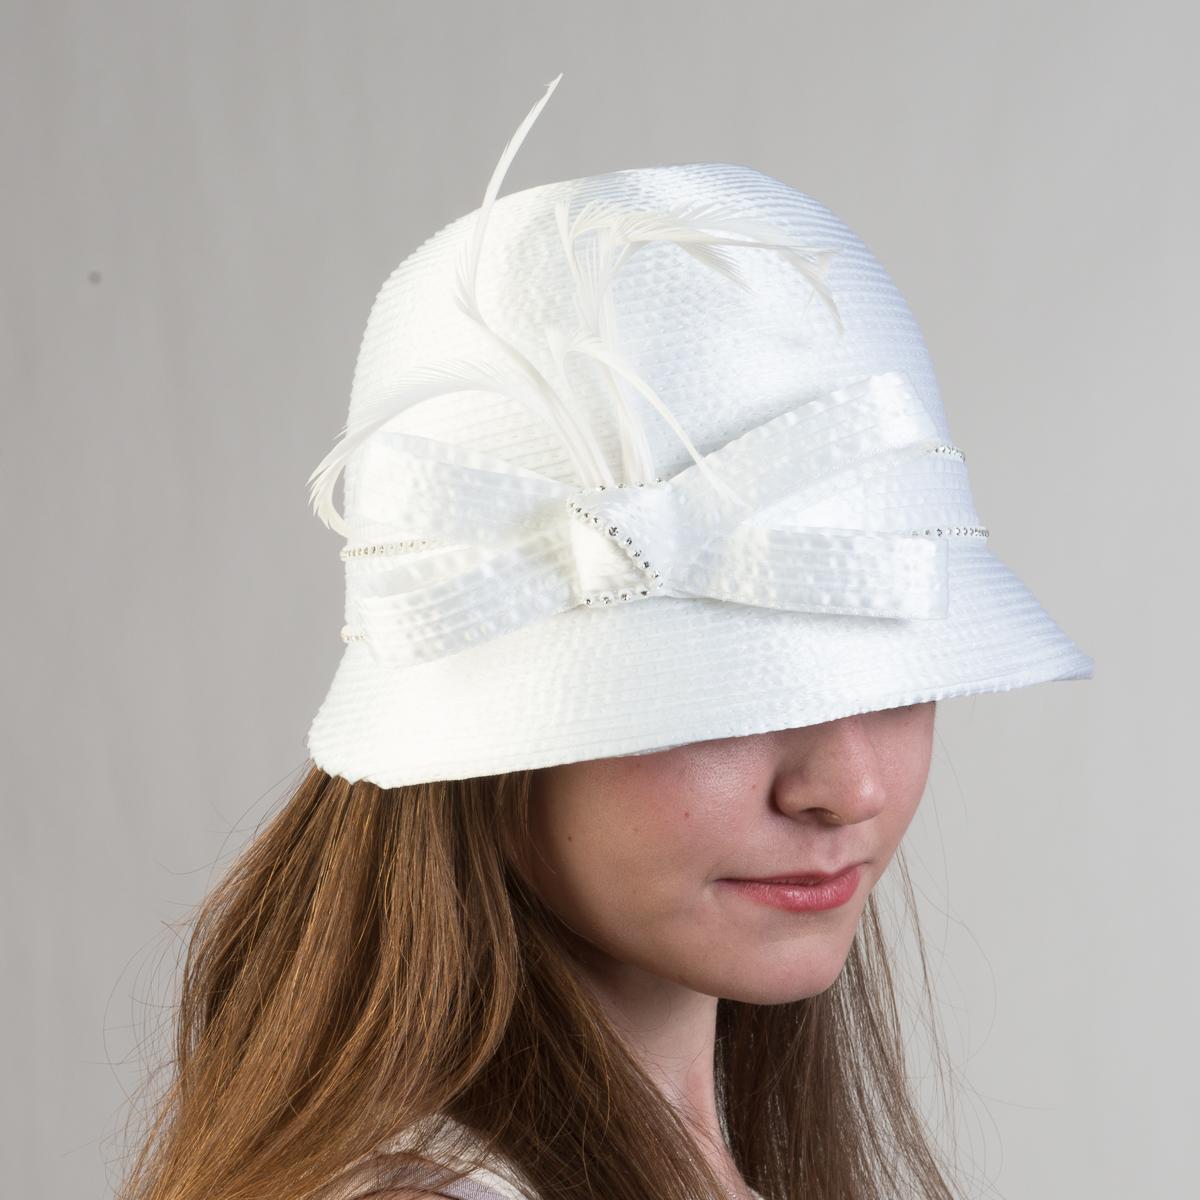 bc1856c1f909c White Small Satin Ribbon Cloche Hats-321775-WT- Sun Yorkos